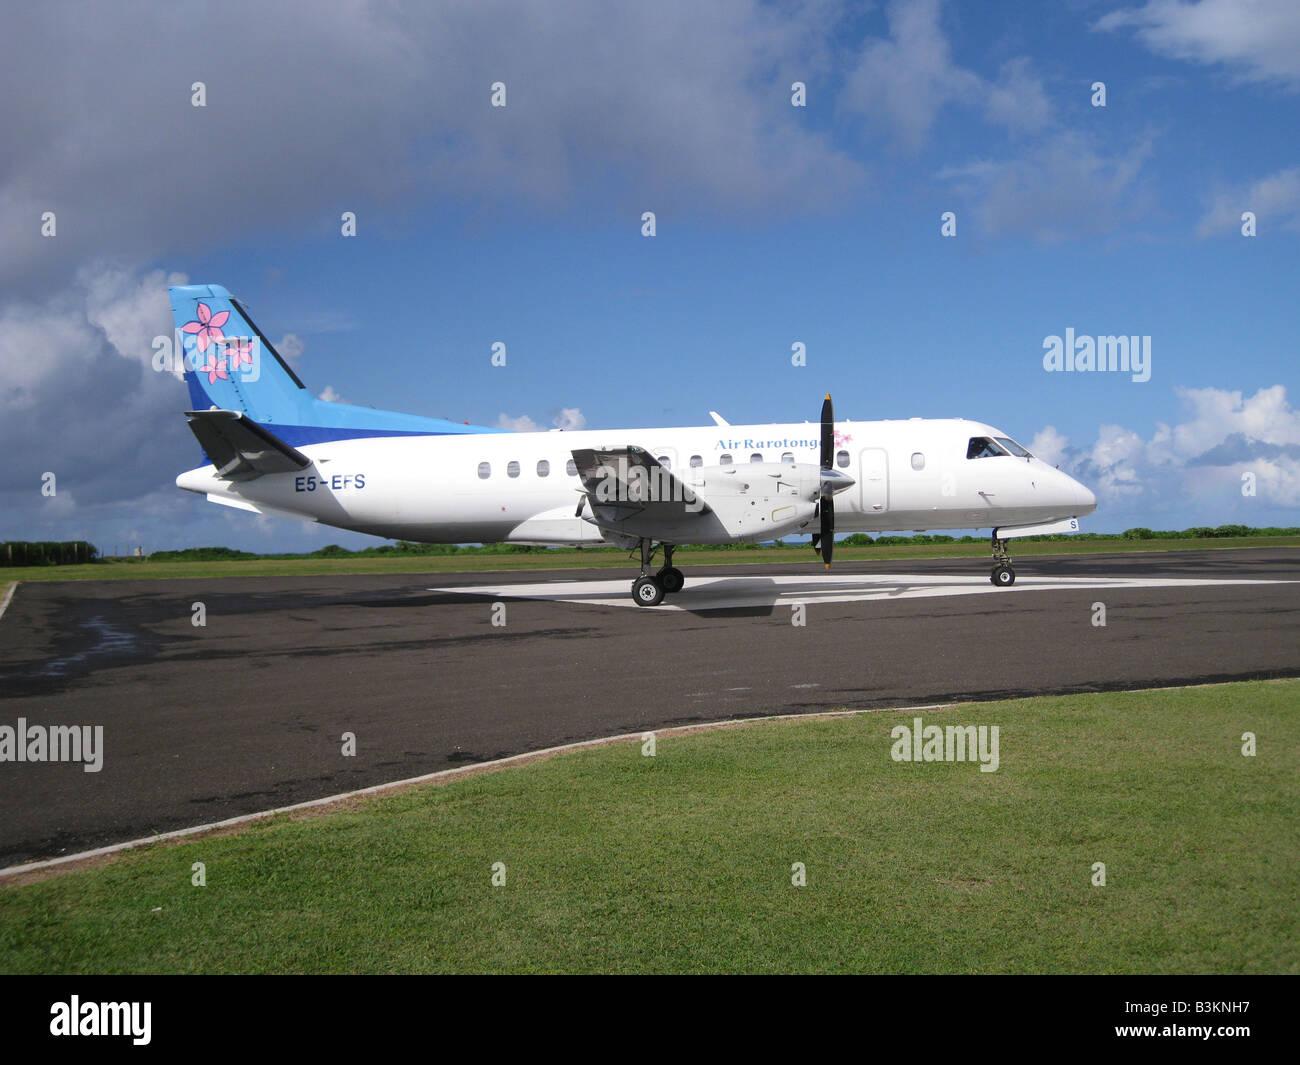 SAAB 340 passenger airliner - Stock Image